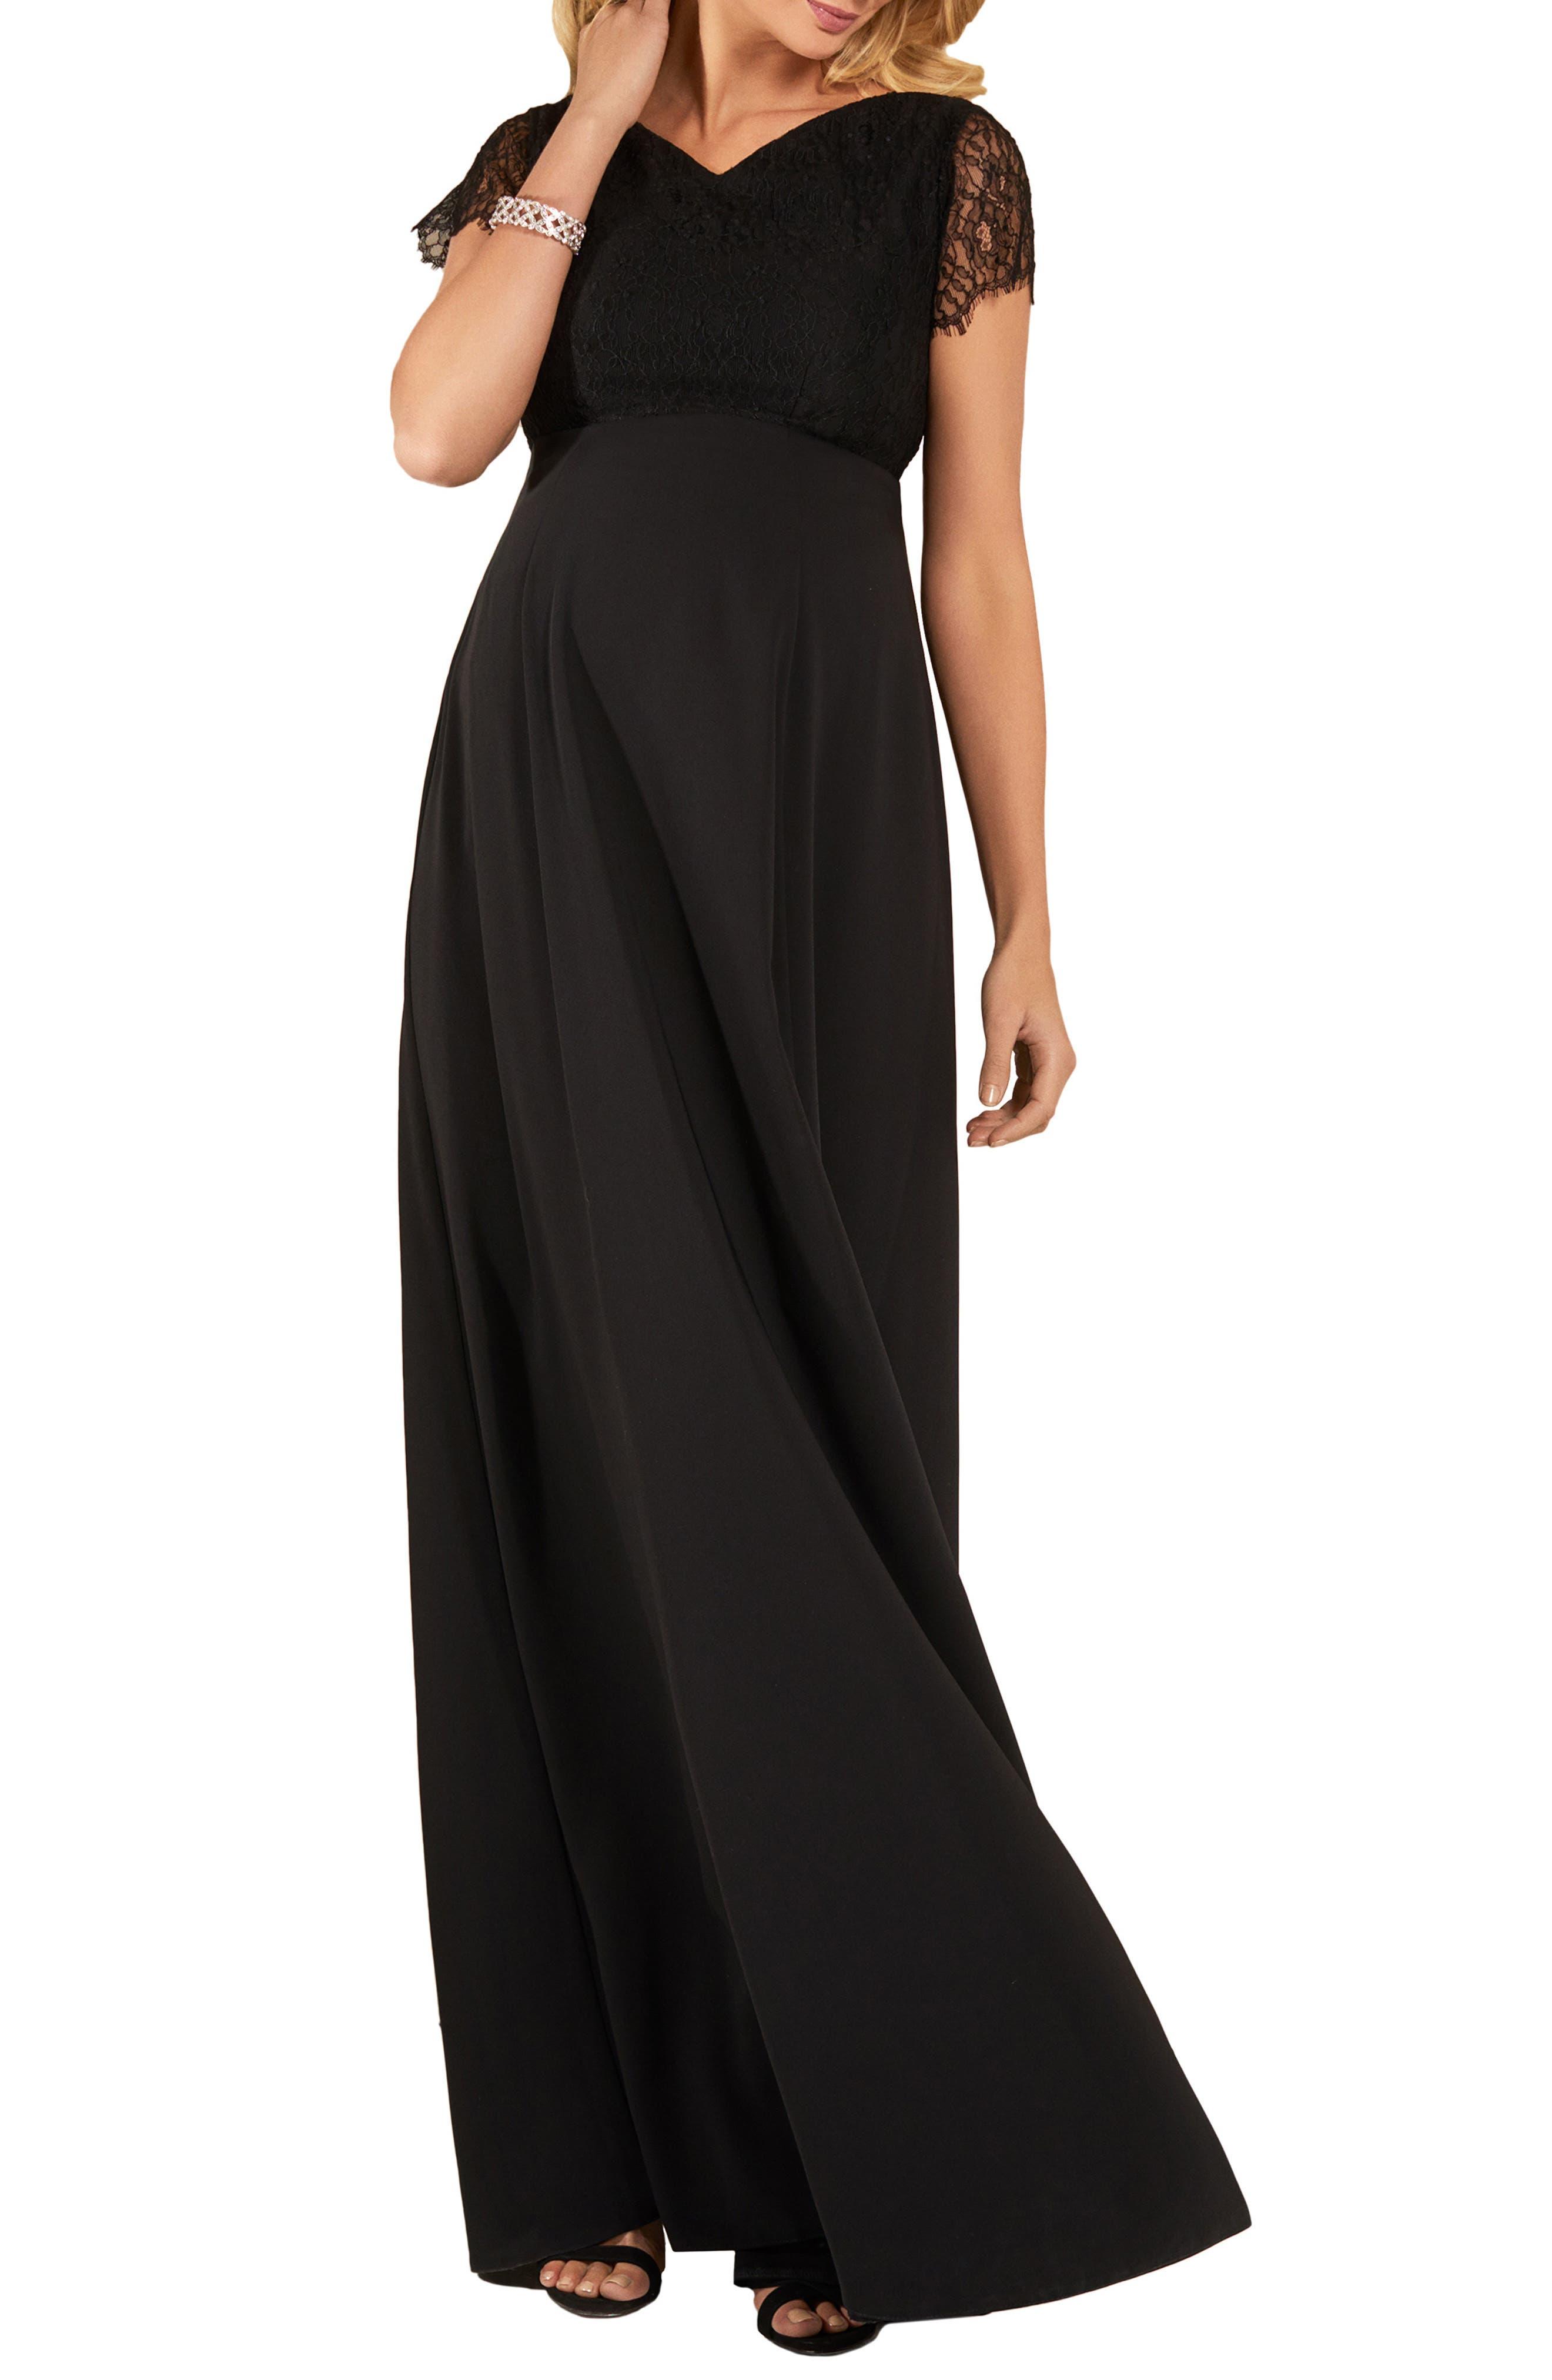 Tiffany Rose Eleanor Maternity Gown, Black